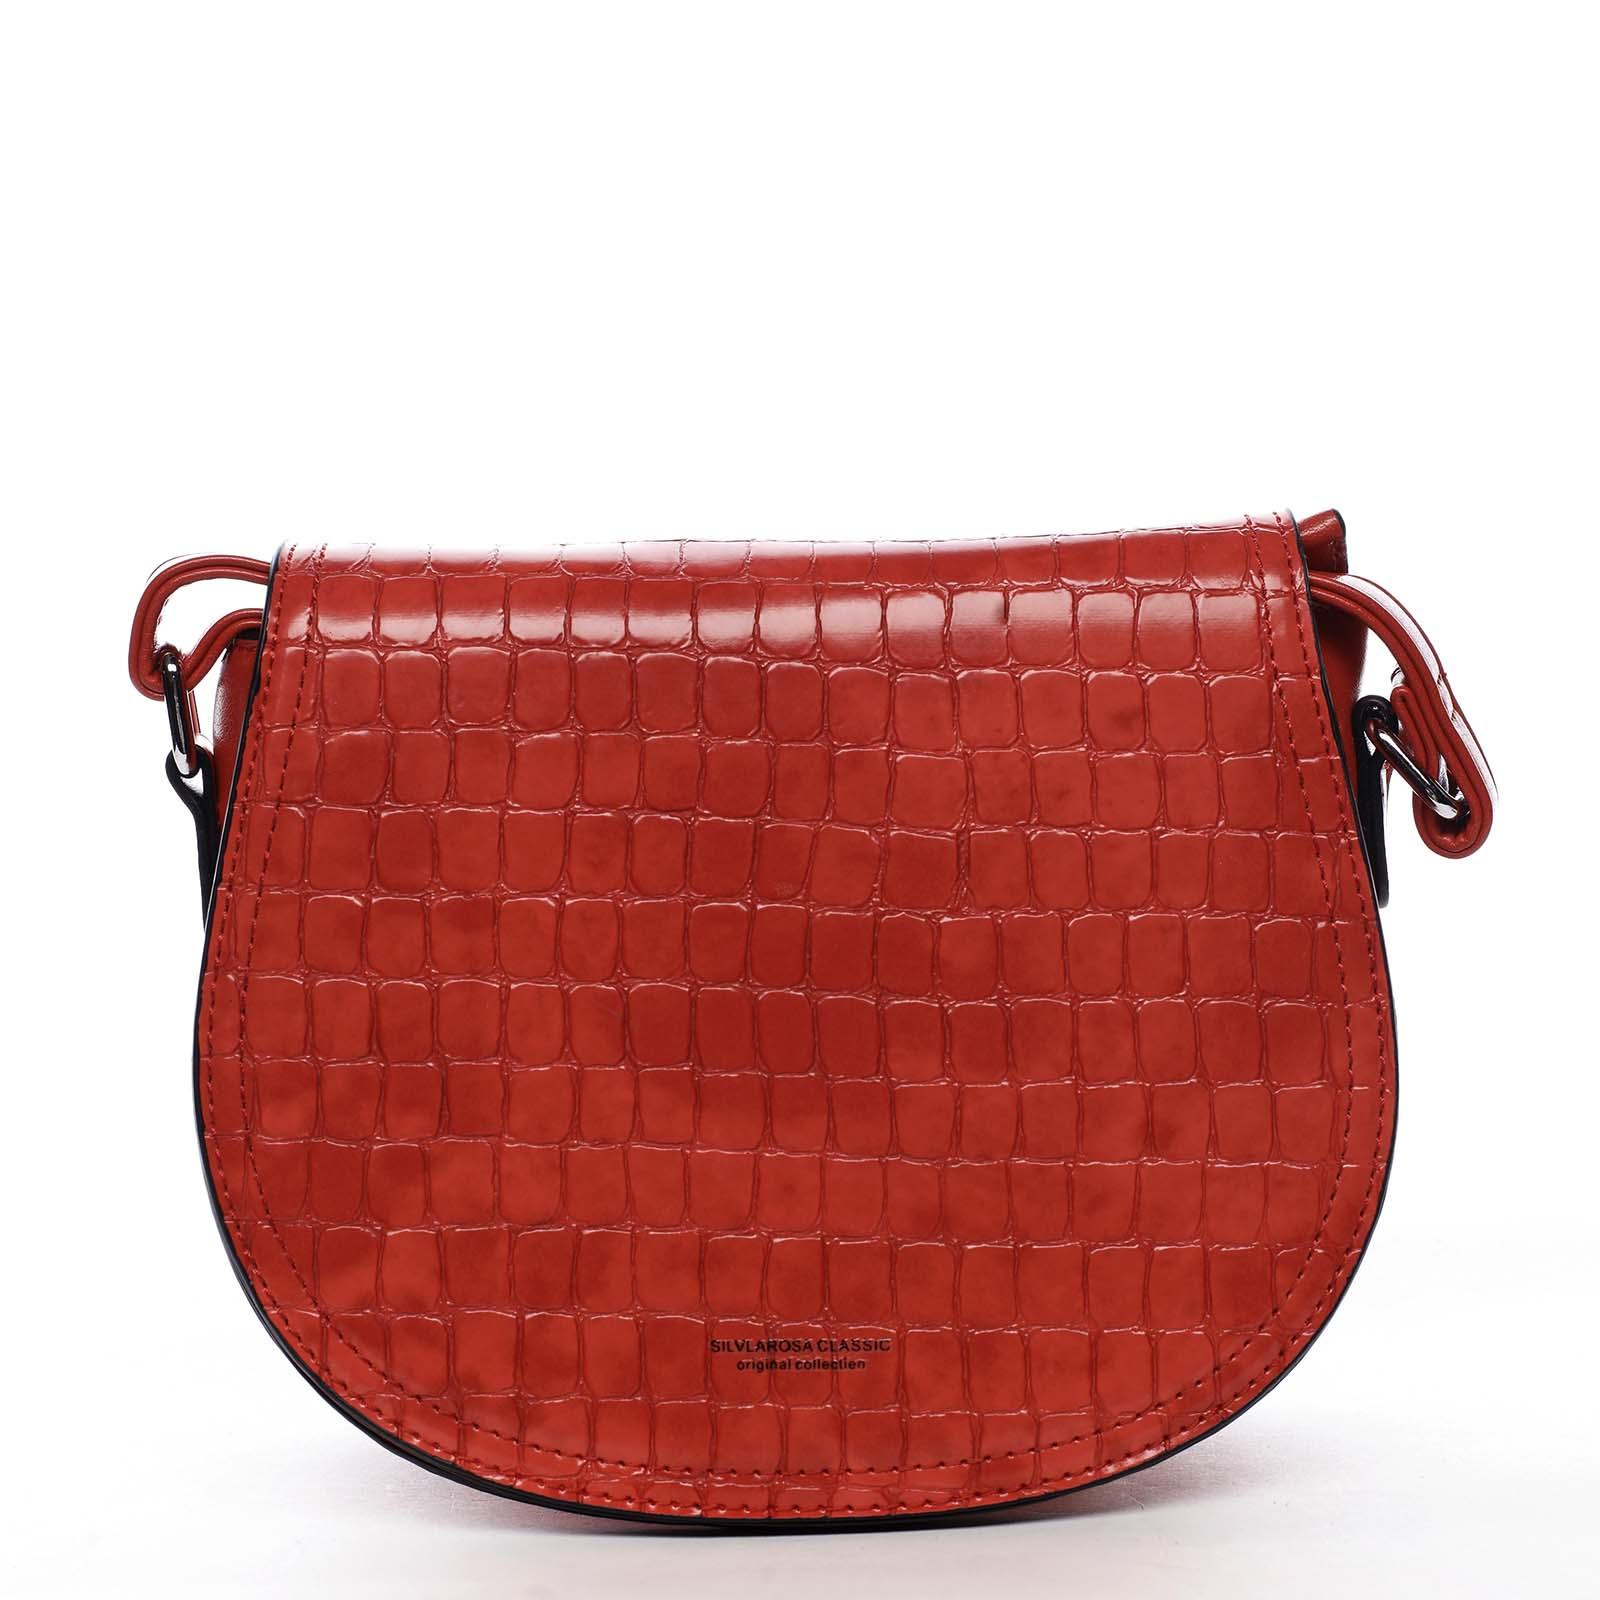 Dámska crossbody kabelka červená - Silvia Rosa Cheer